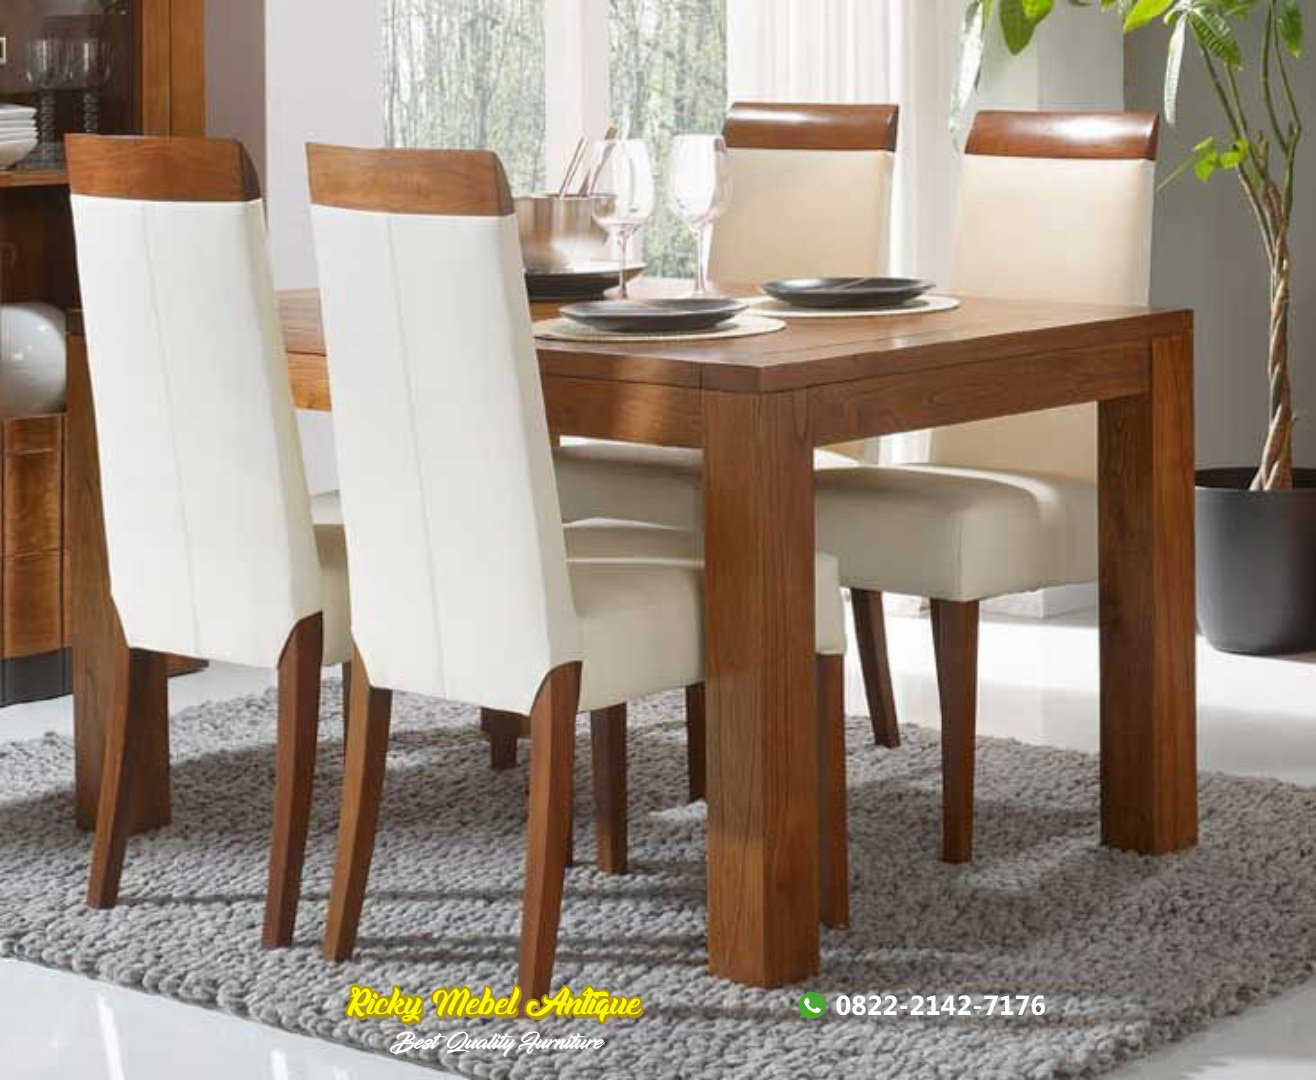 Set meja makan jati minimalis terbaru